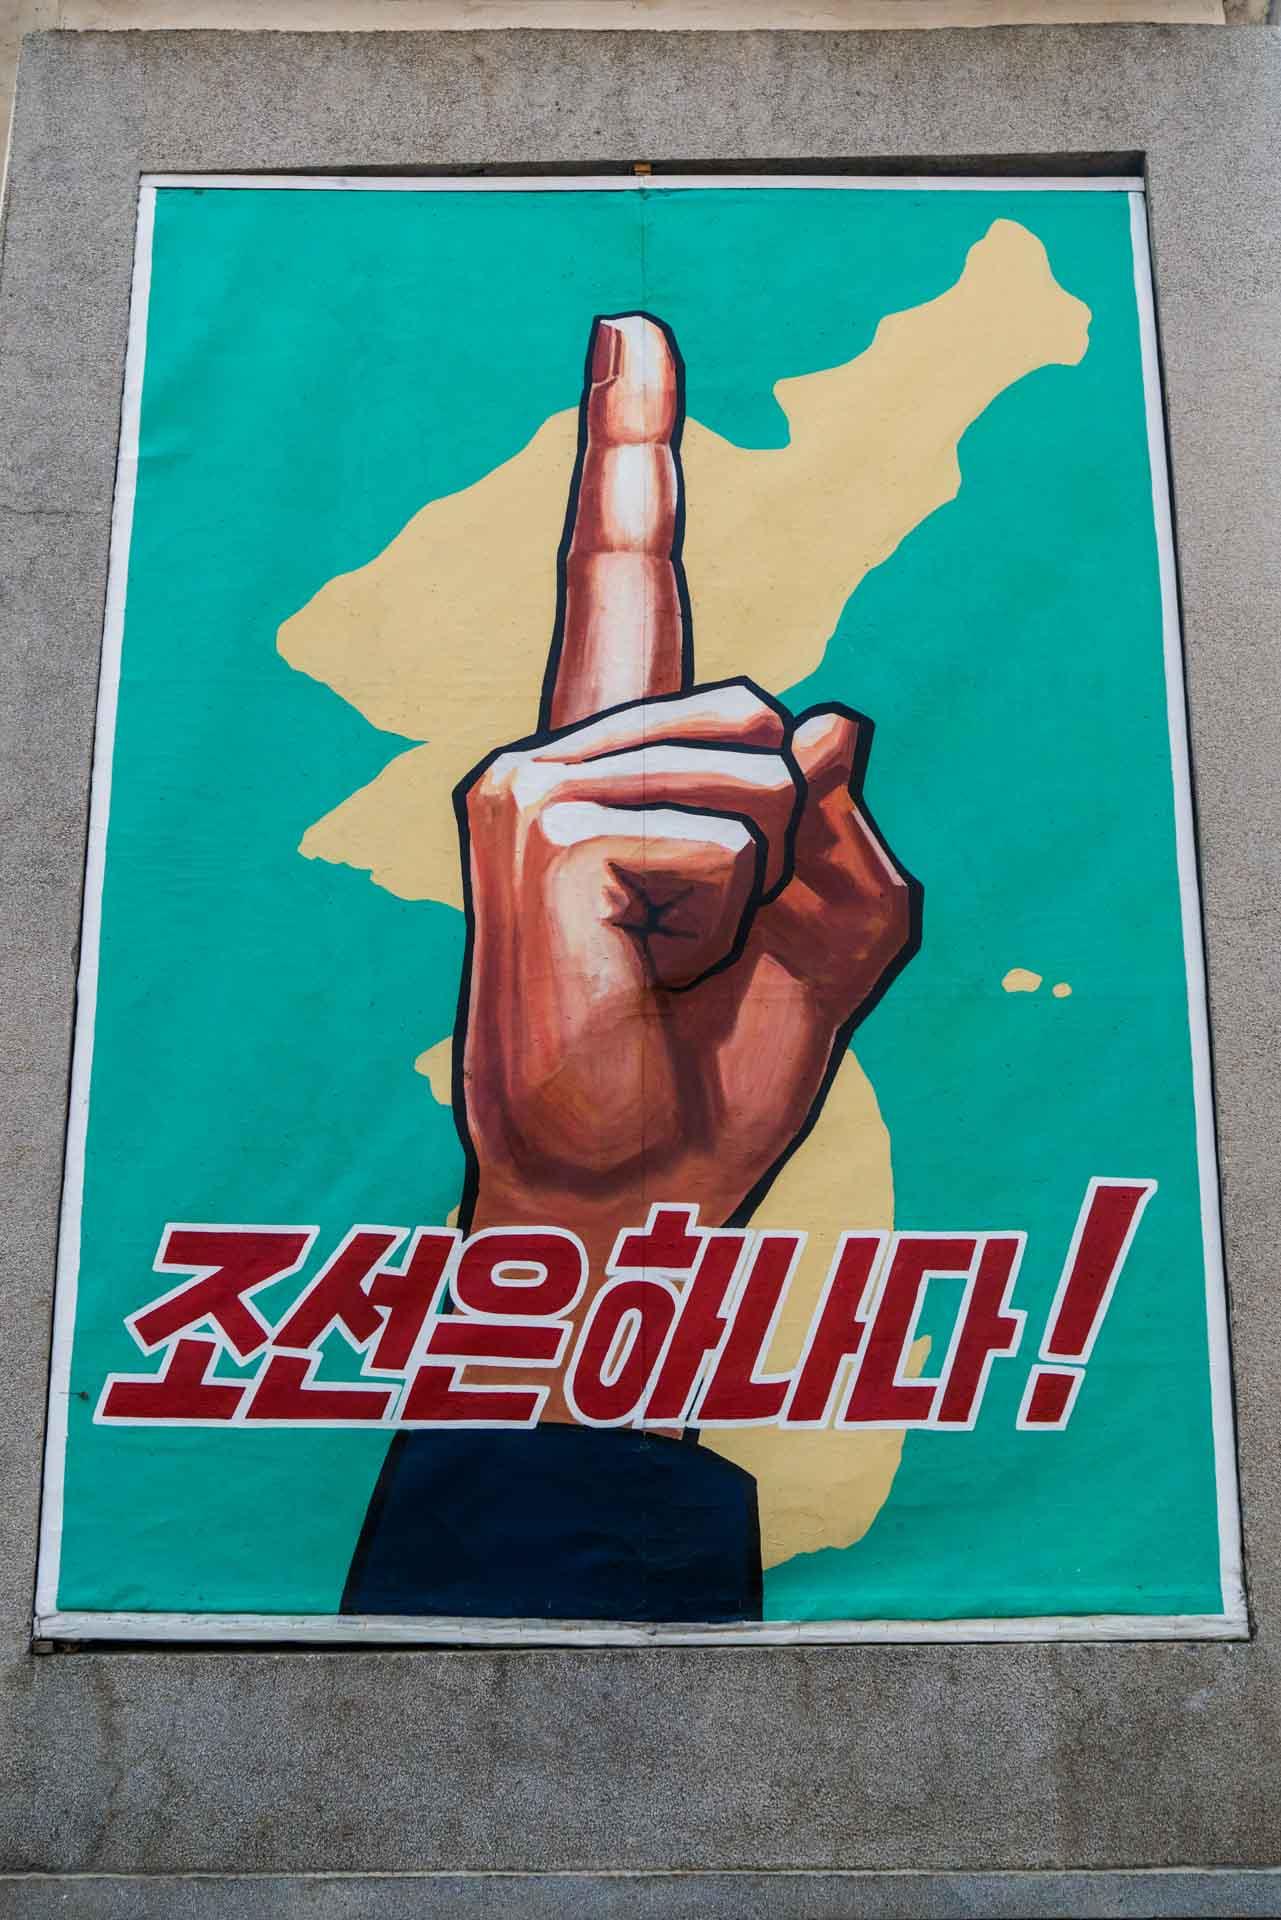 A Red Superhero in North Korea Enrico Pescantini pyongyang propaganda art 5